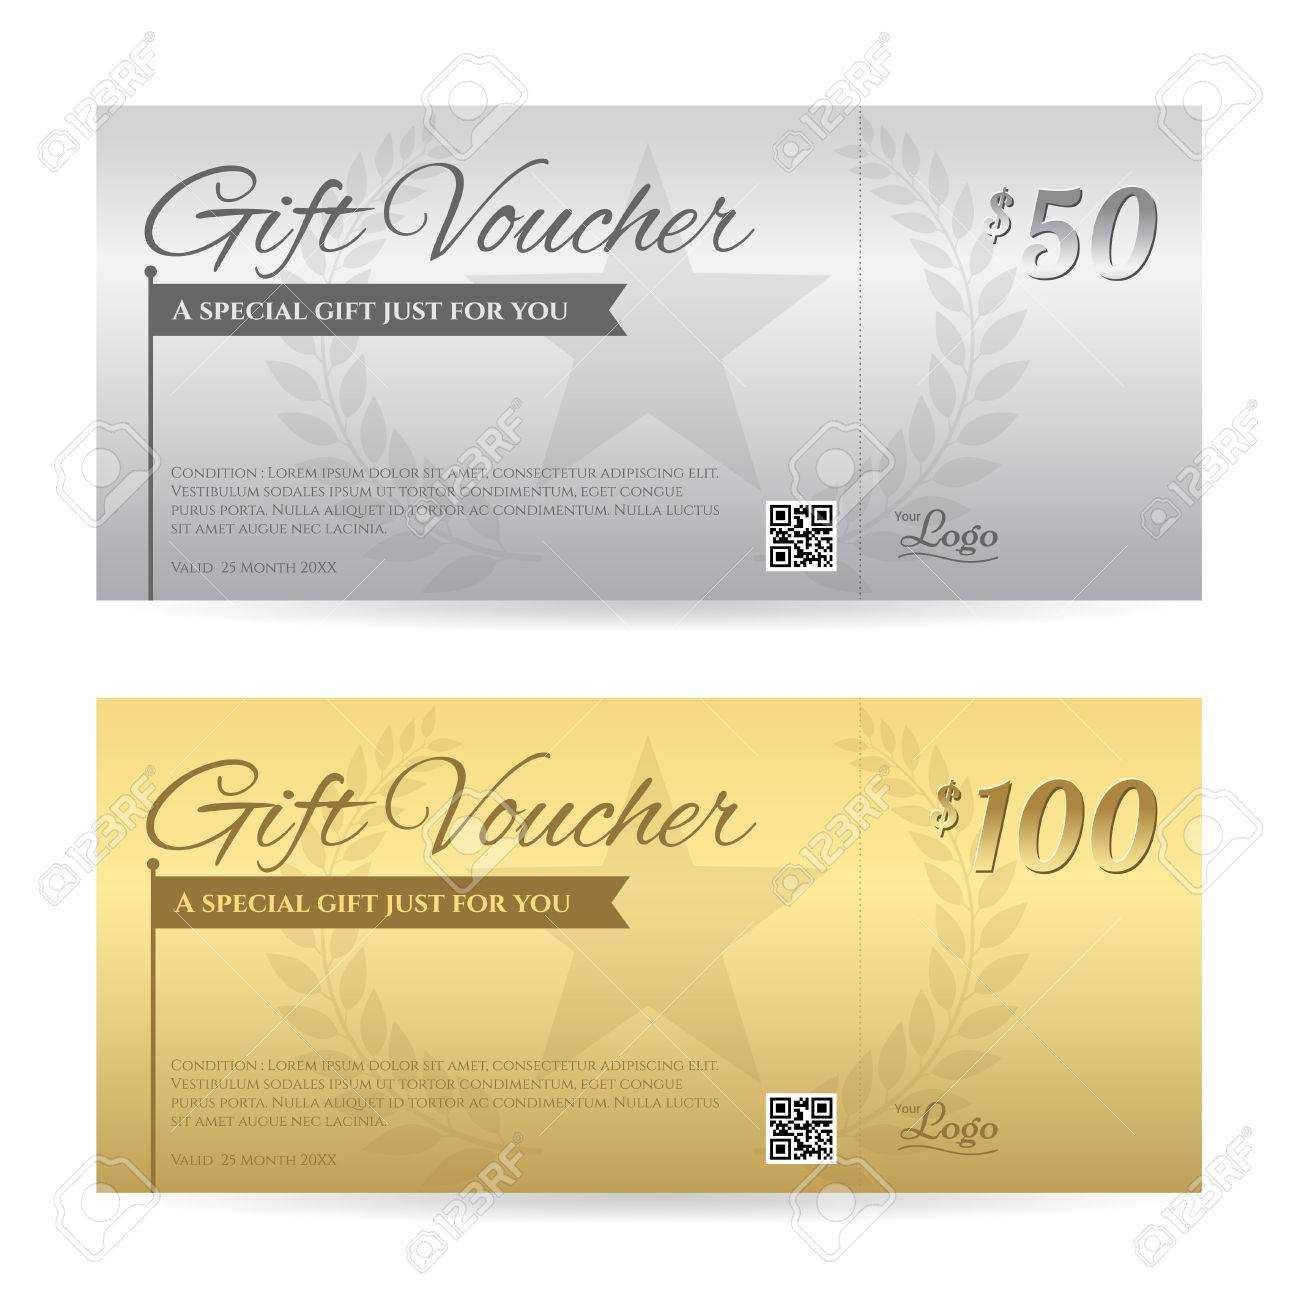 Elegant Gift Voucher Or Gift Card Certificate Template In Gold.. With Elegant Gift Certificate Template